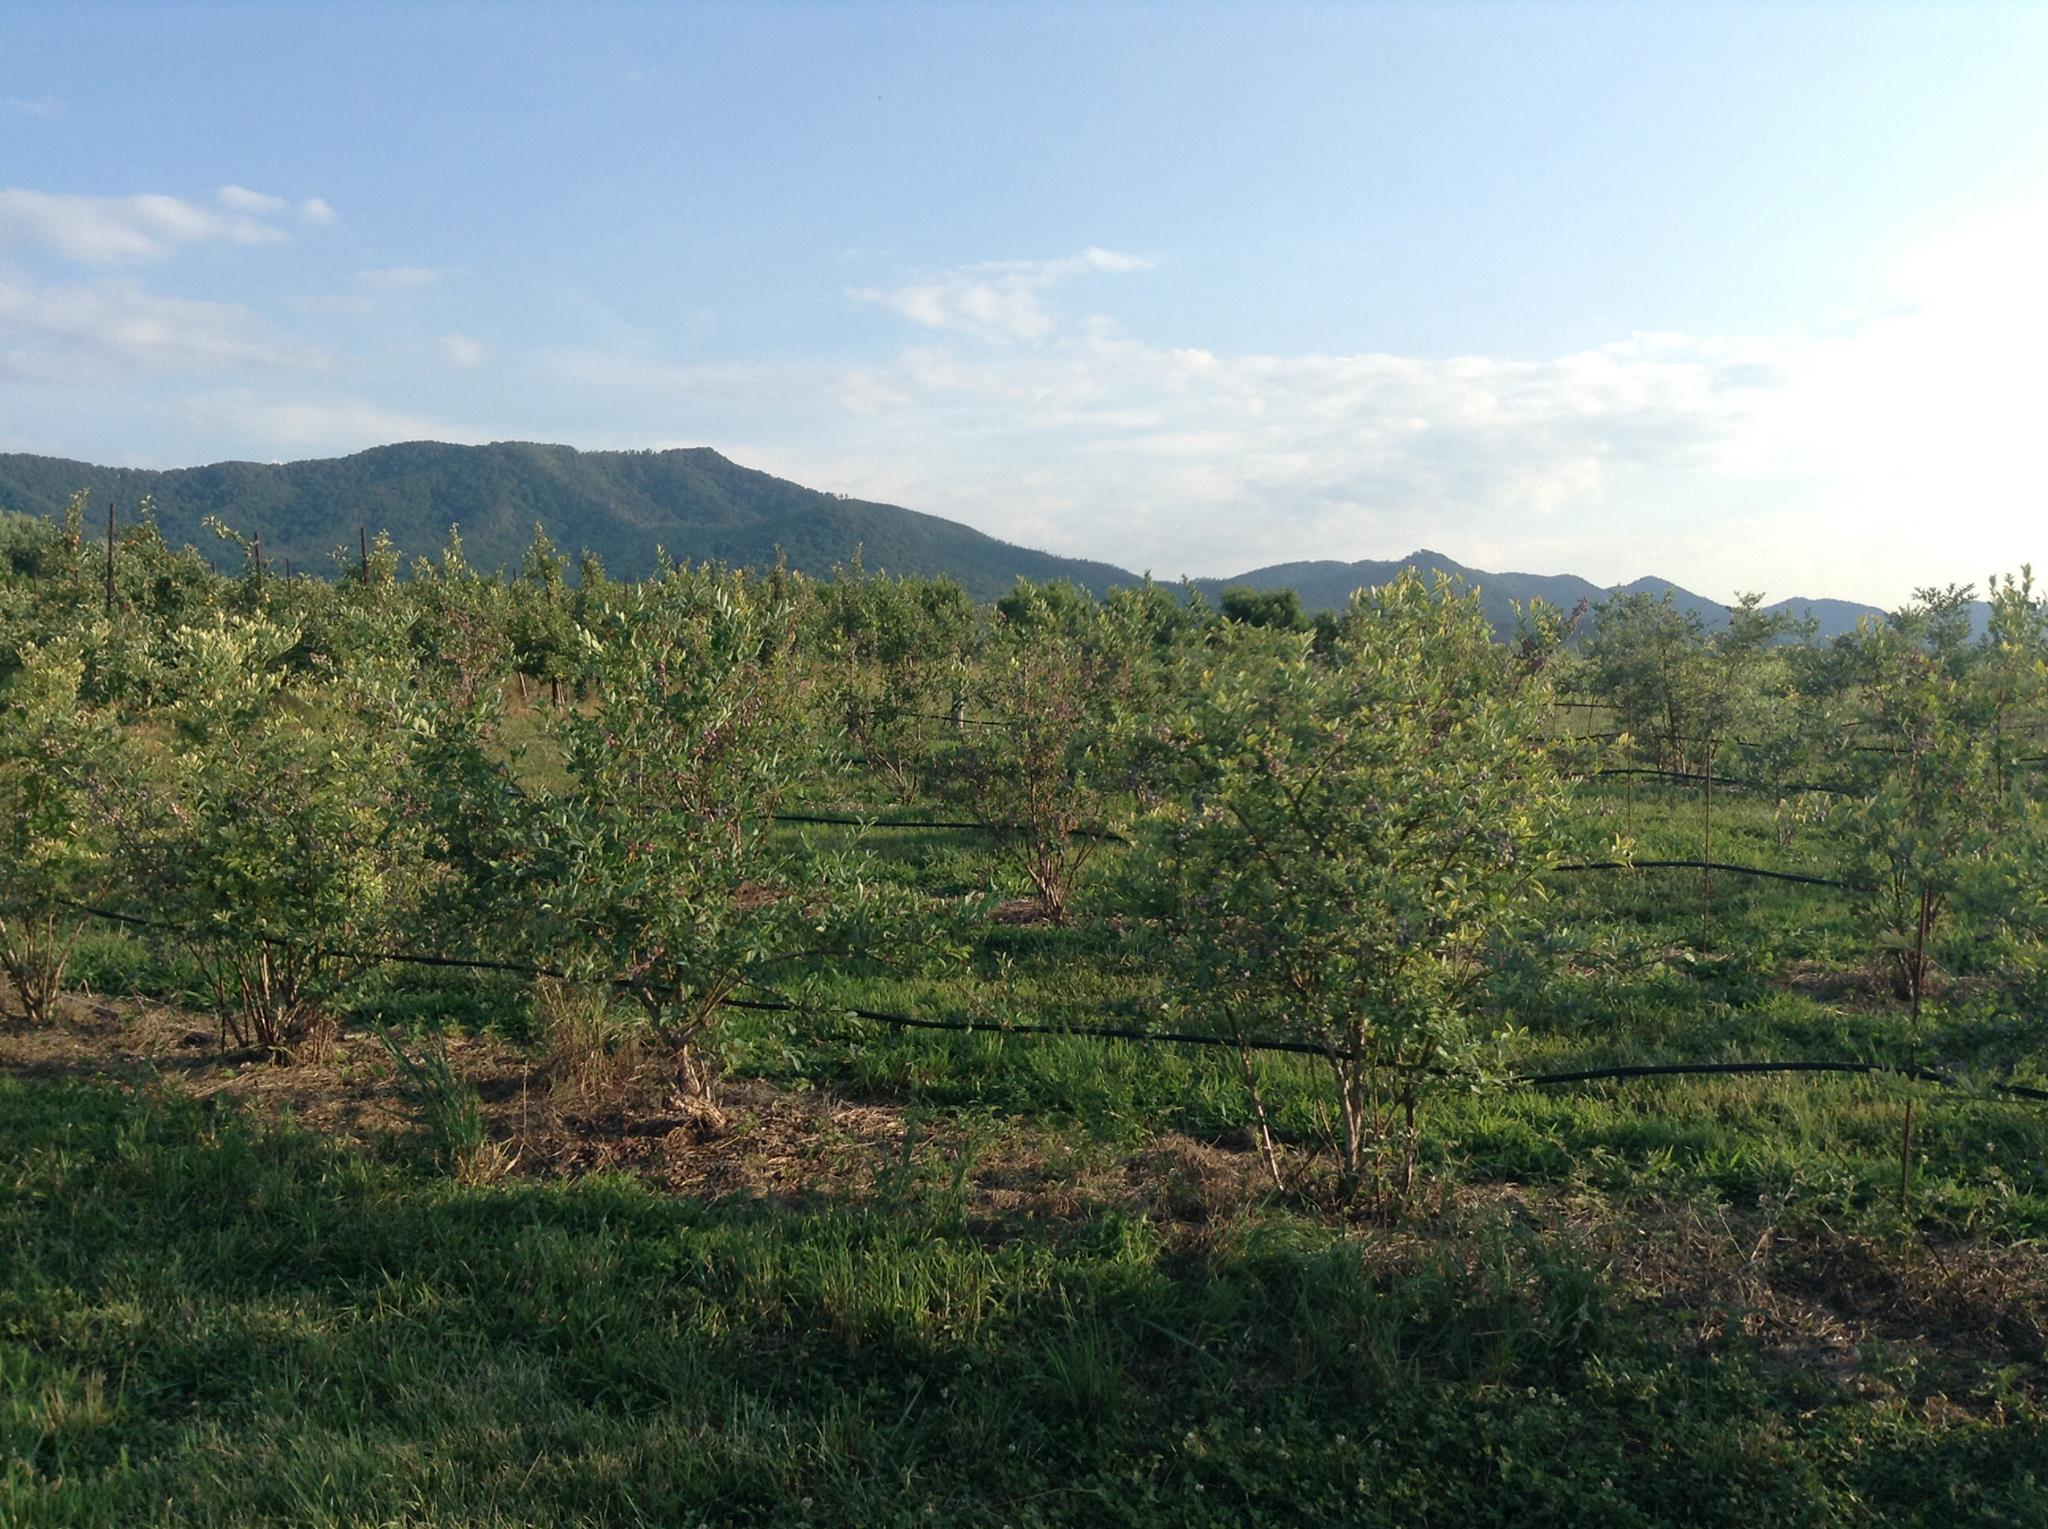 Buffalo Trail Orchard